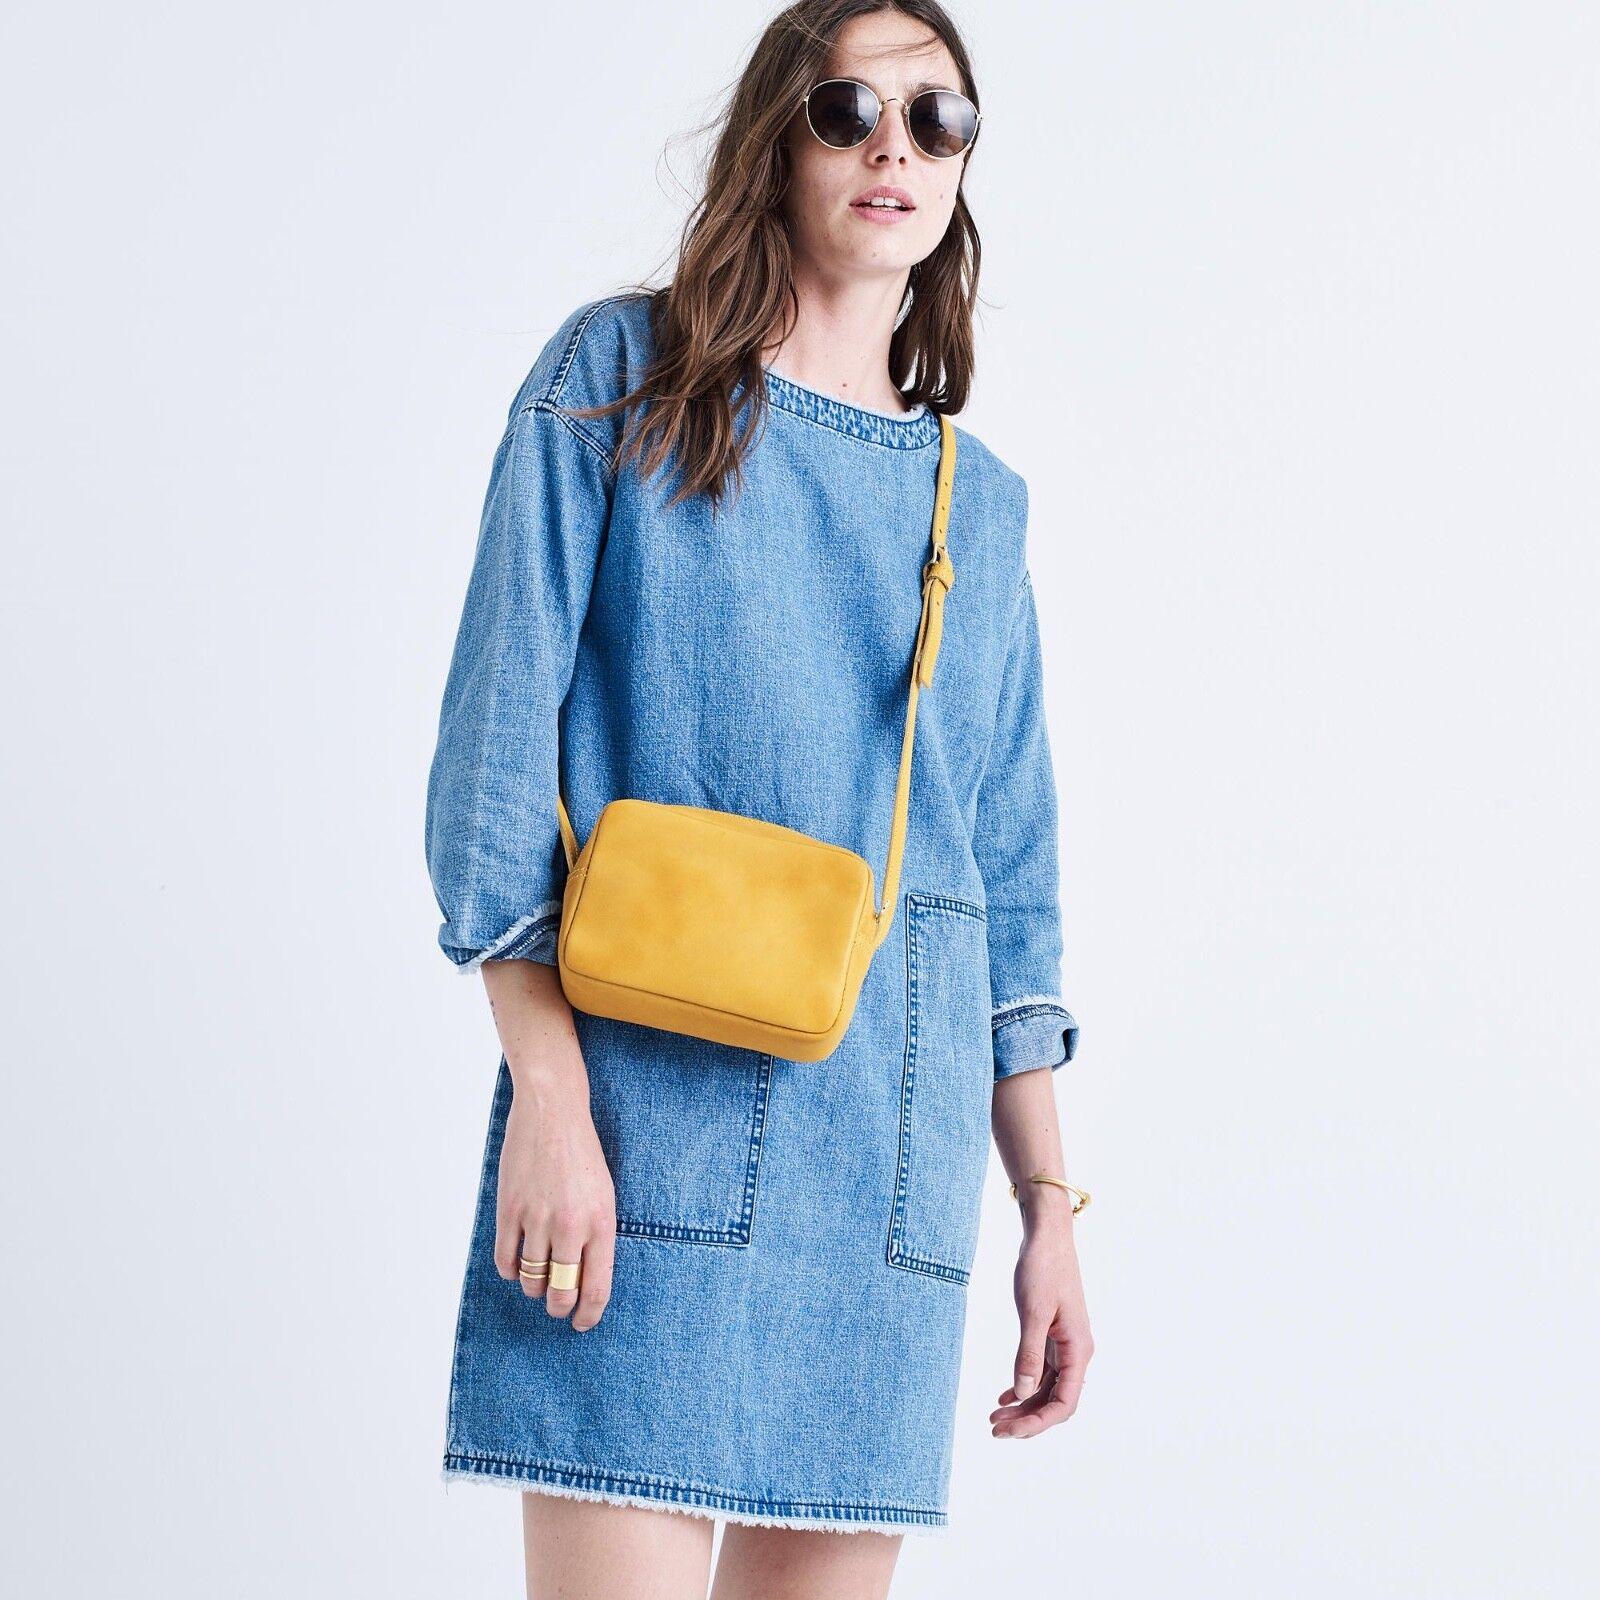 MADEWELL Raw-Edge Denim Shirtdress Dress Sold Out Sz Med NWT